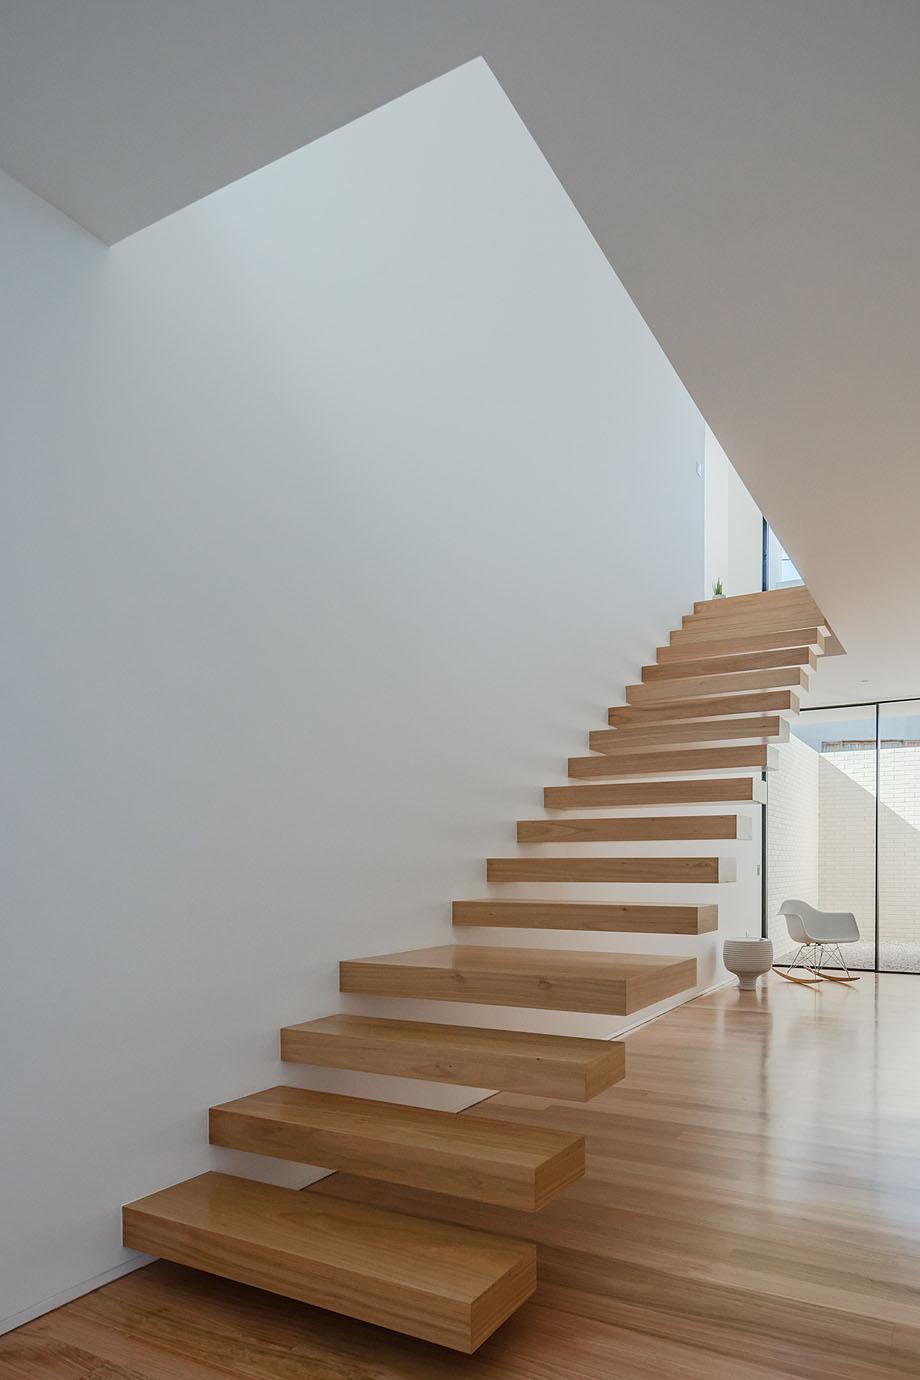 Casa Touguinha - Raulino Arquitecto (2)